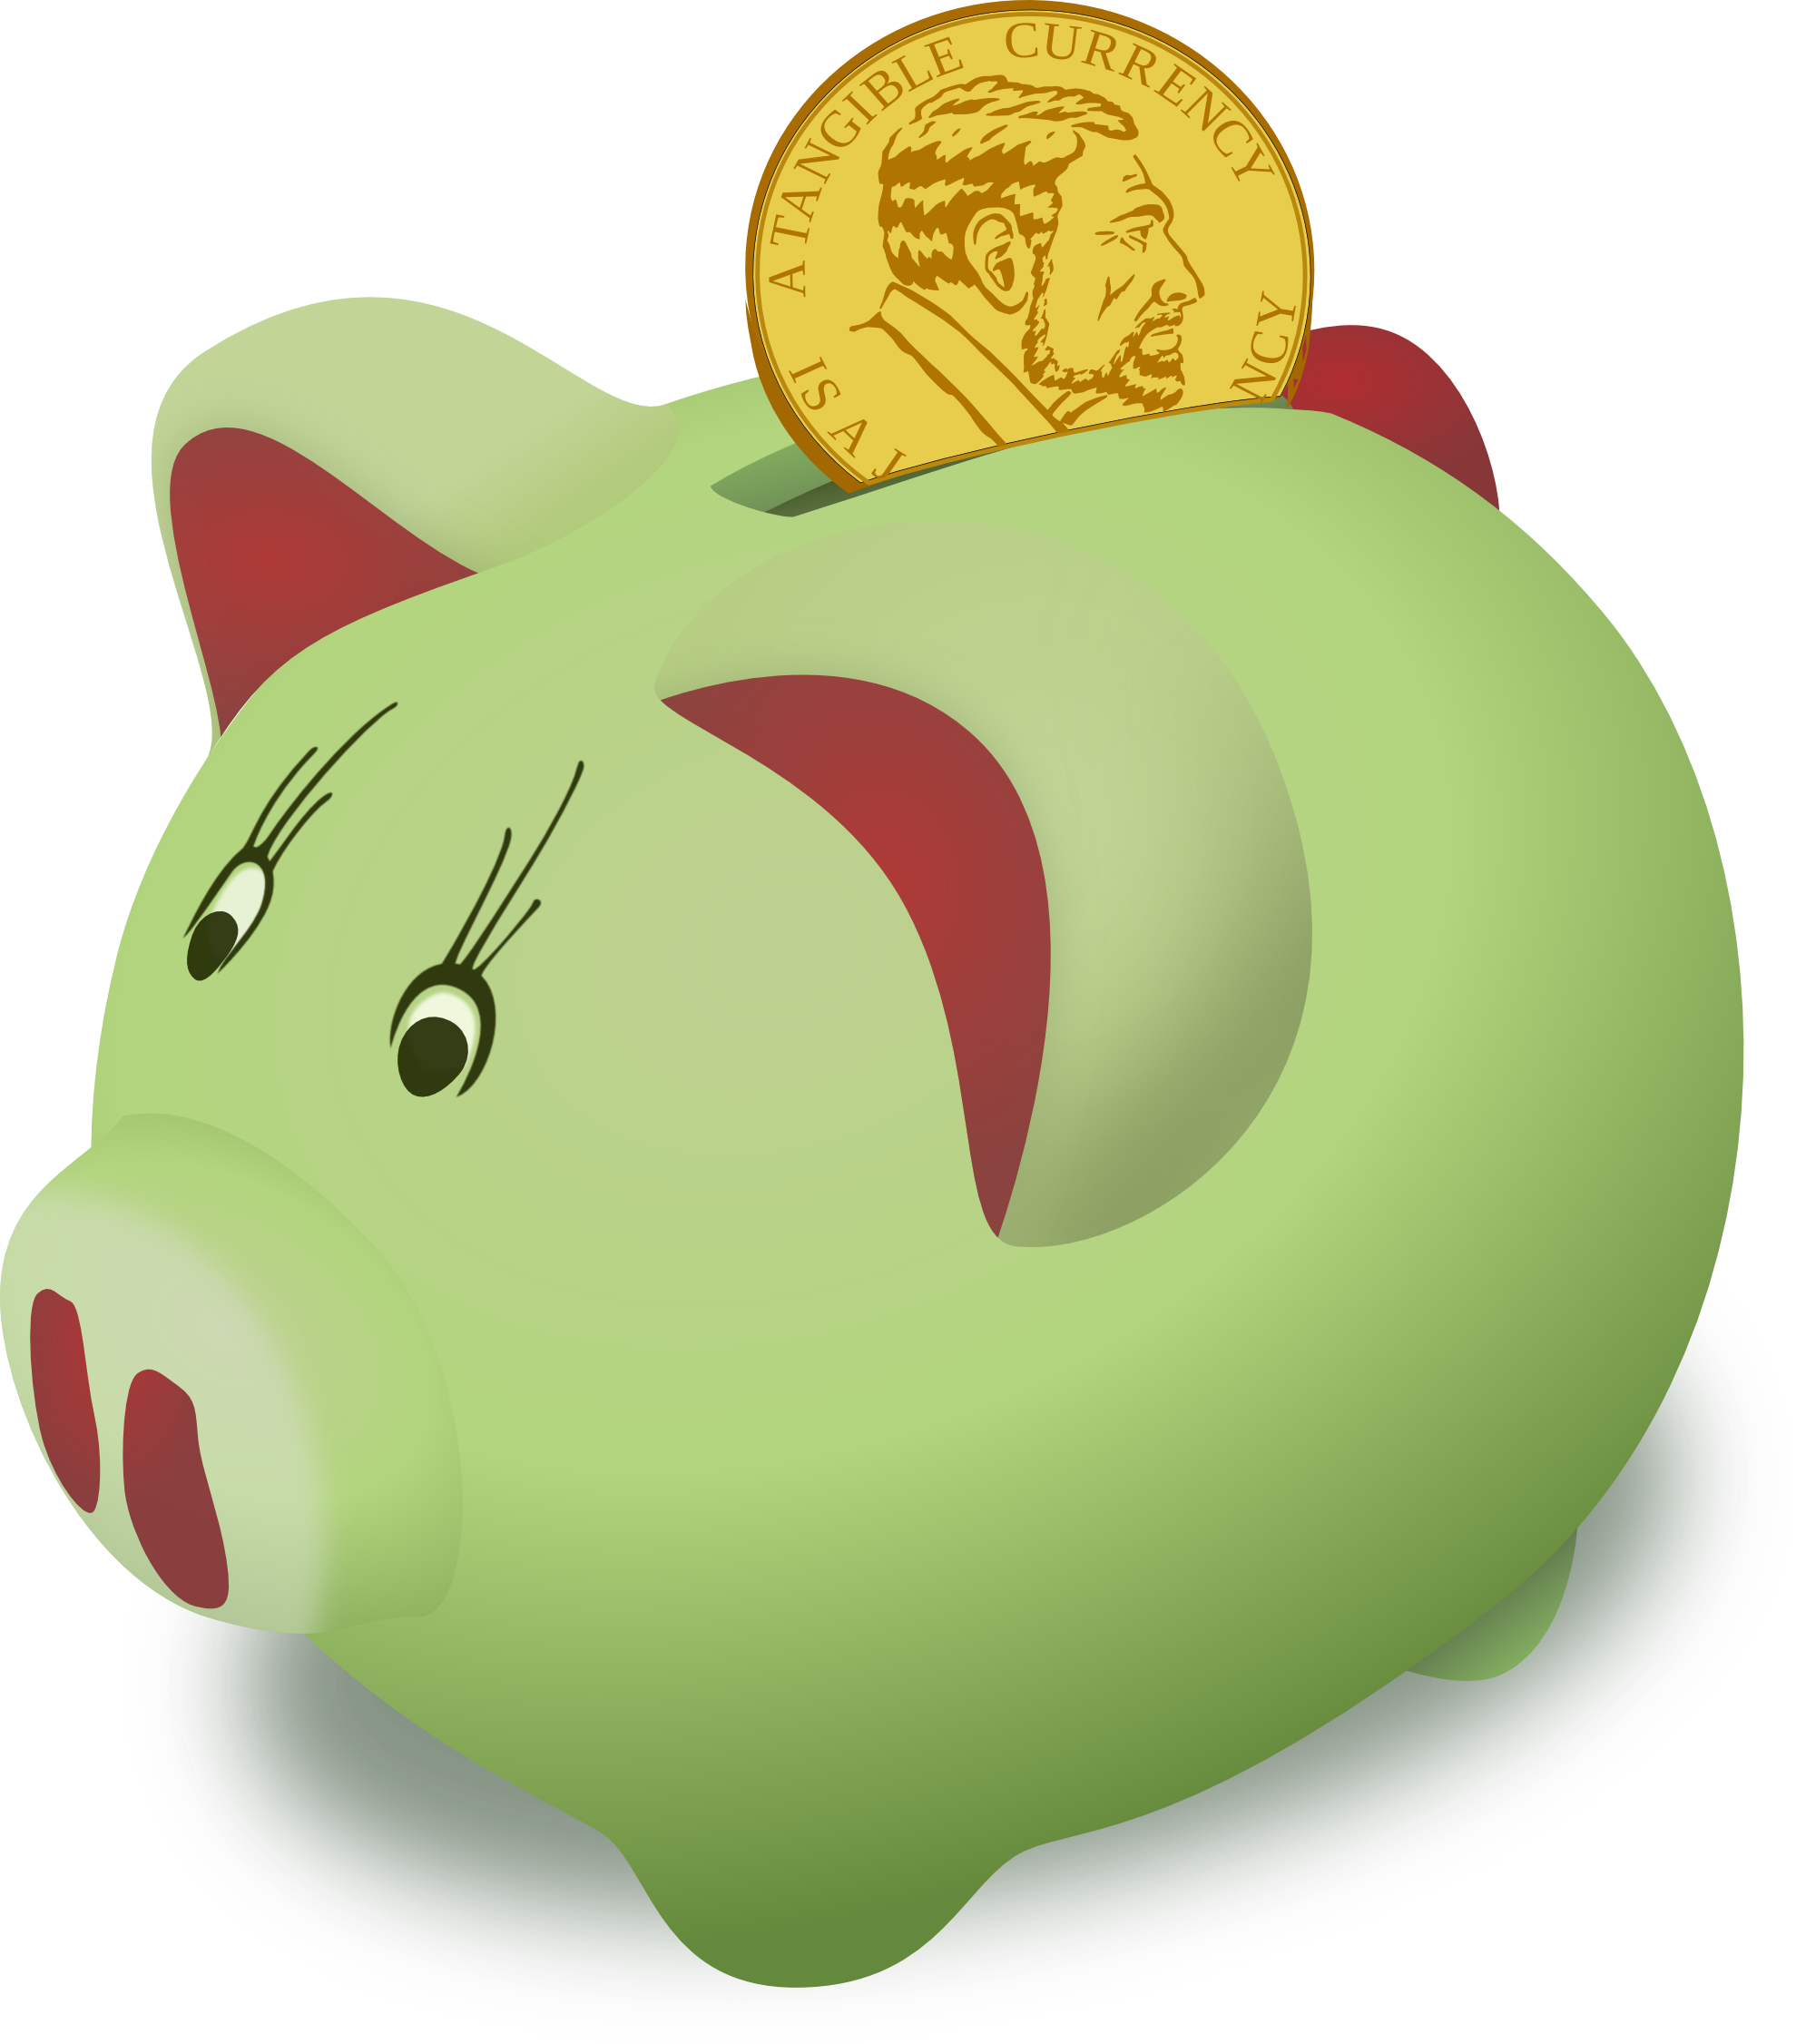 Saving clipart clipart panda free clipart images for Transparent piggy bank money box